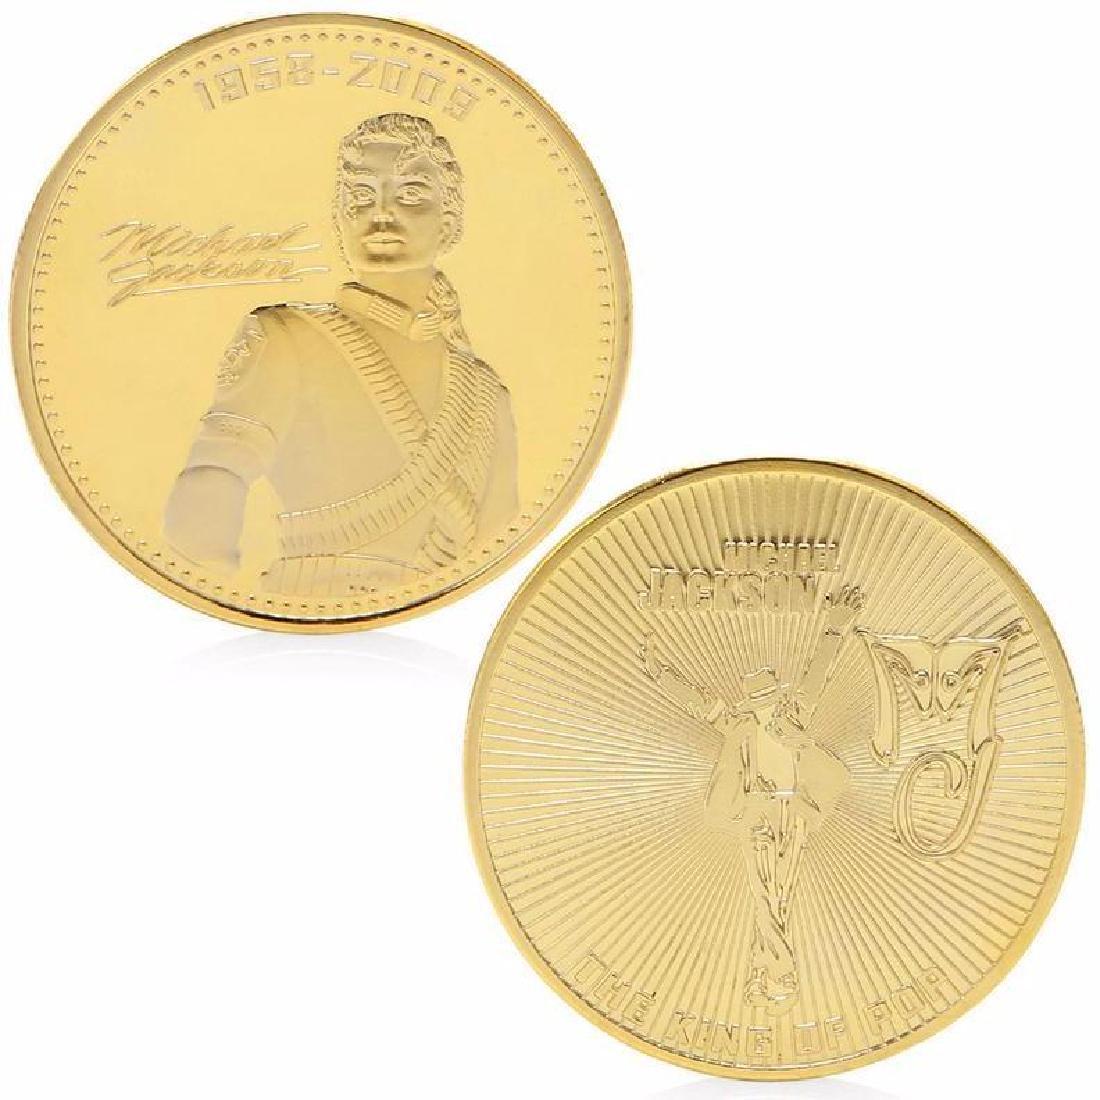 Michael Jackson Gold Clad Commemorative Coin